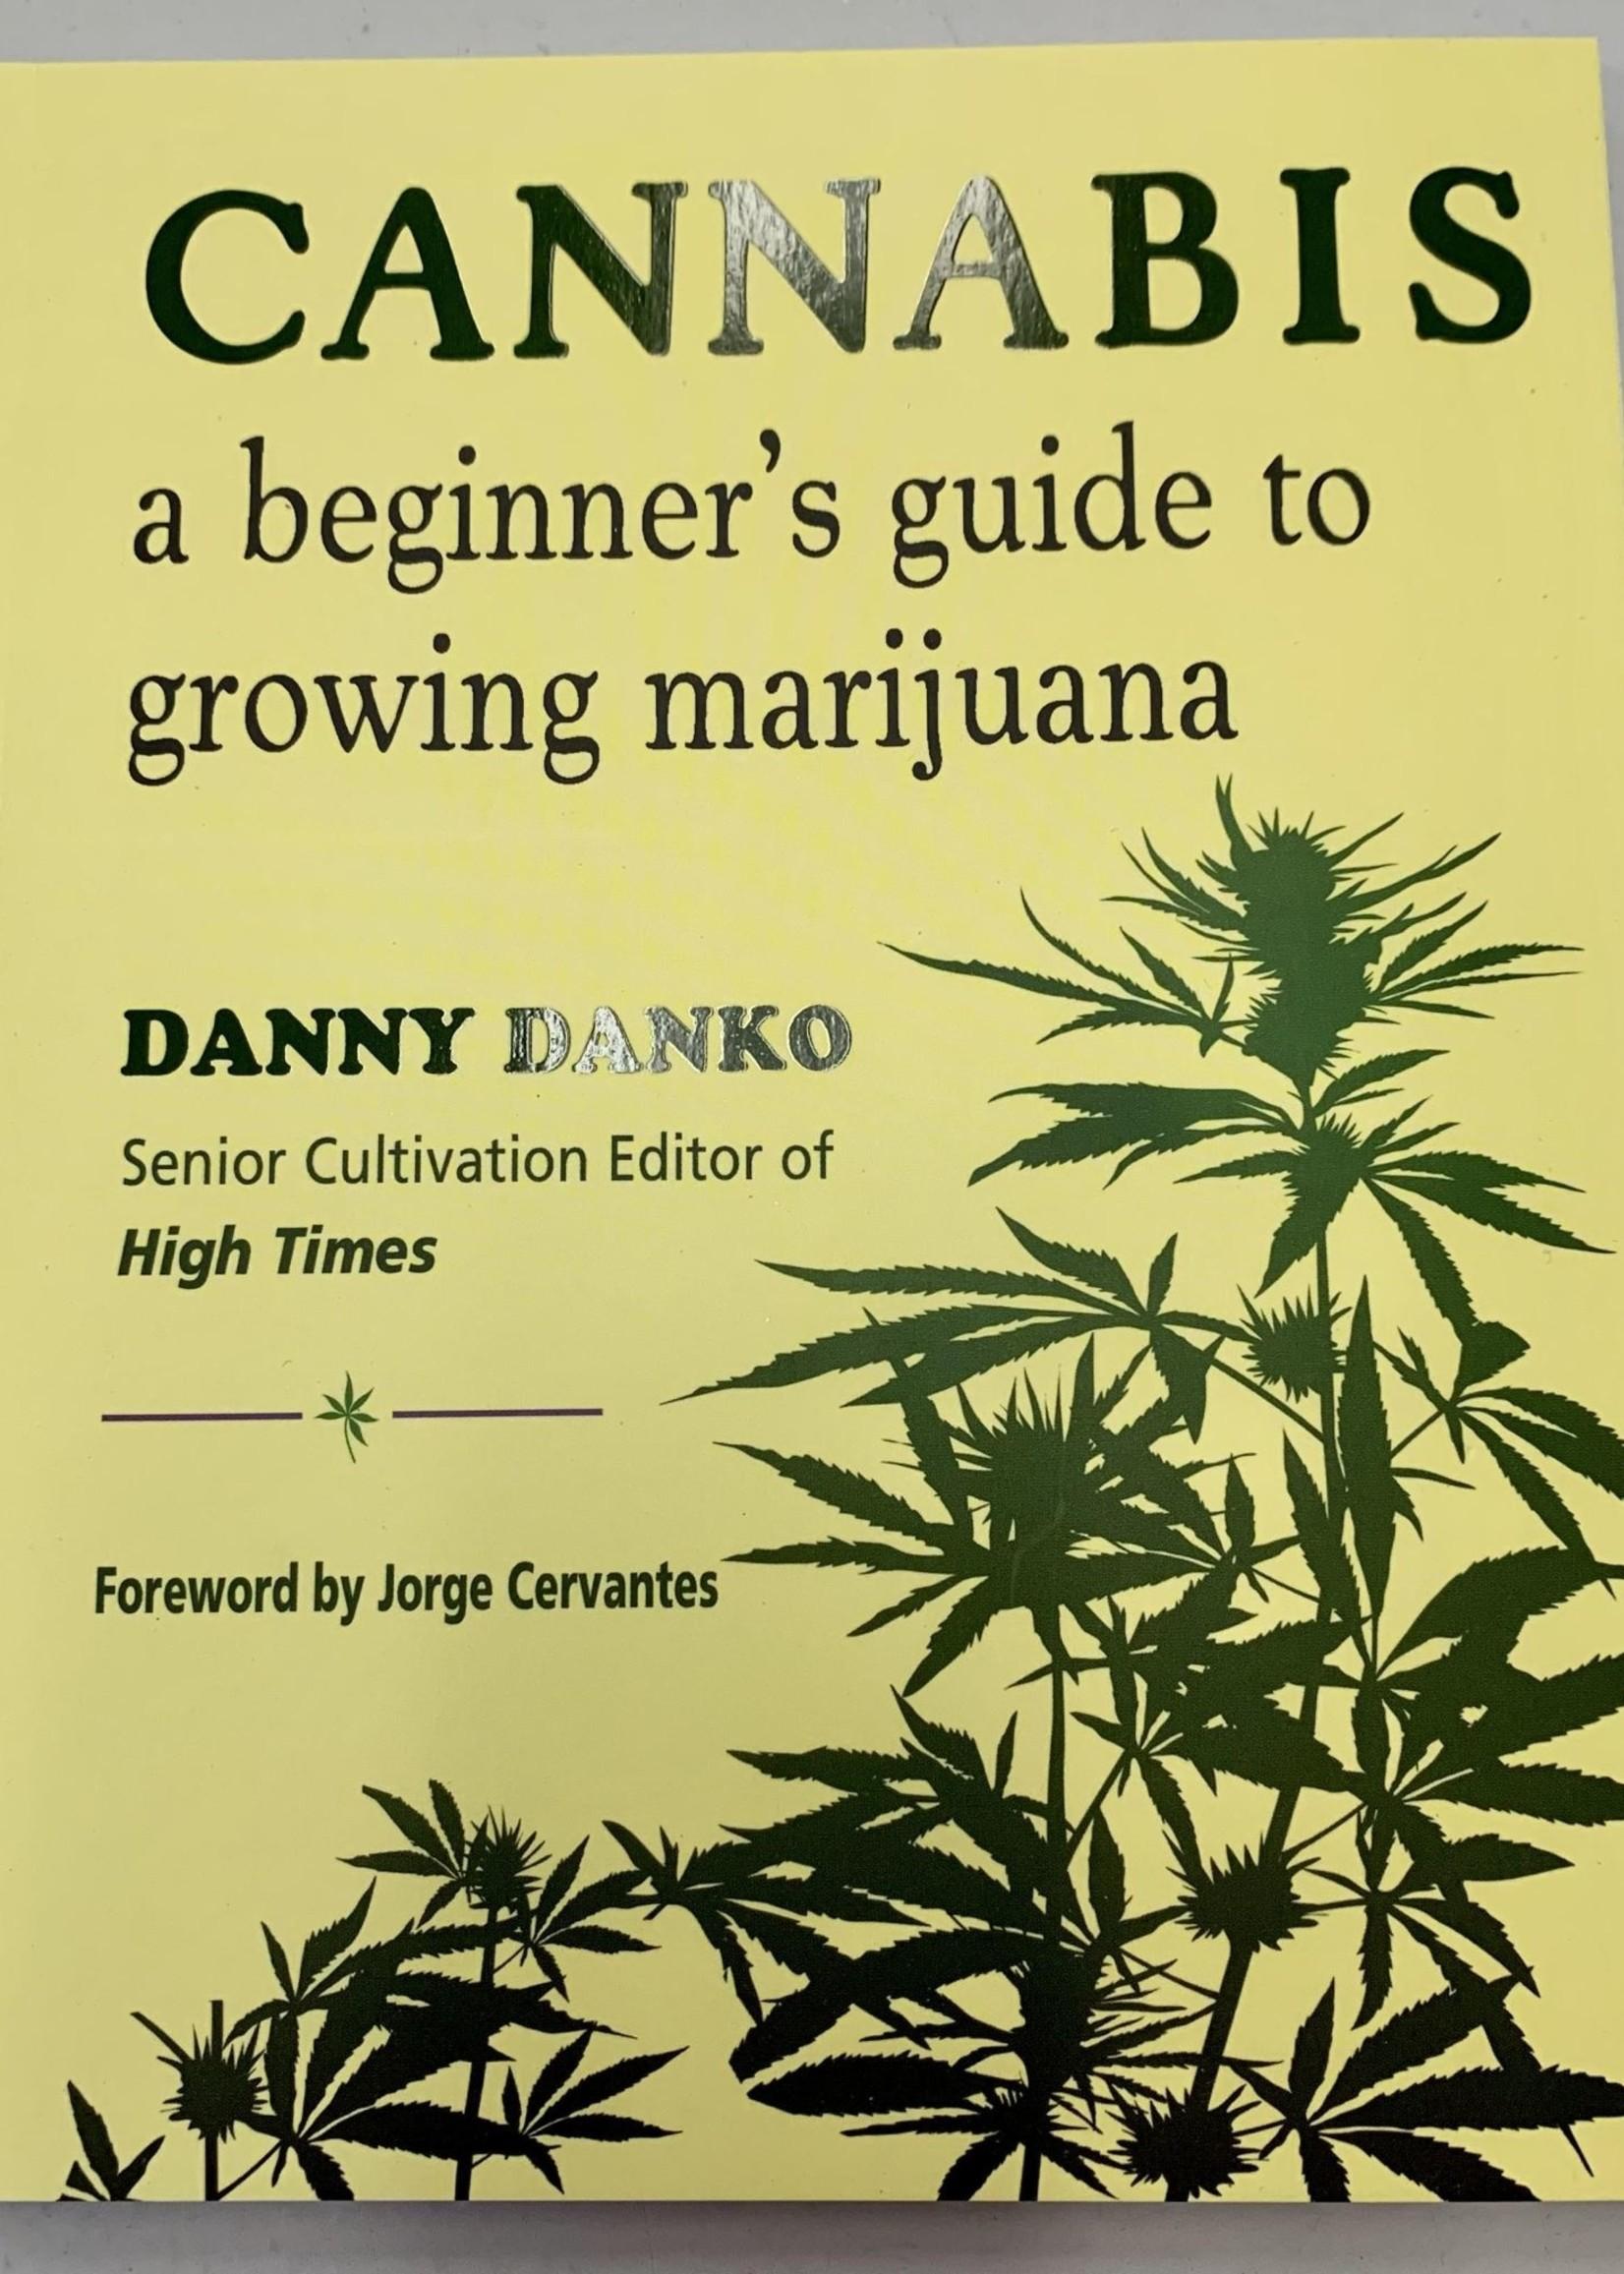 Cannabis A Beginner's Guide to Growing Marijuana - Danny Danko